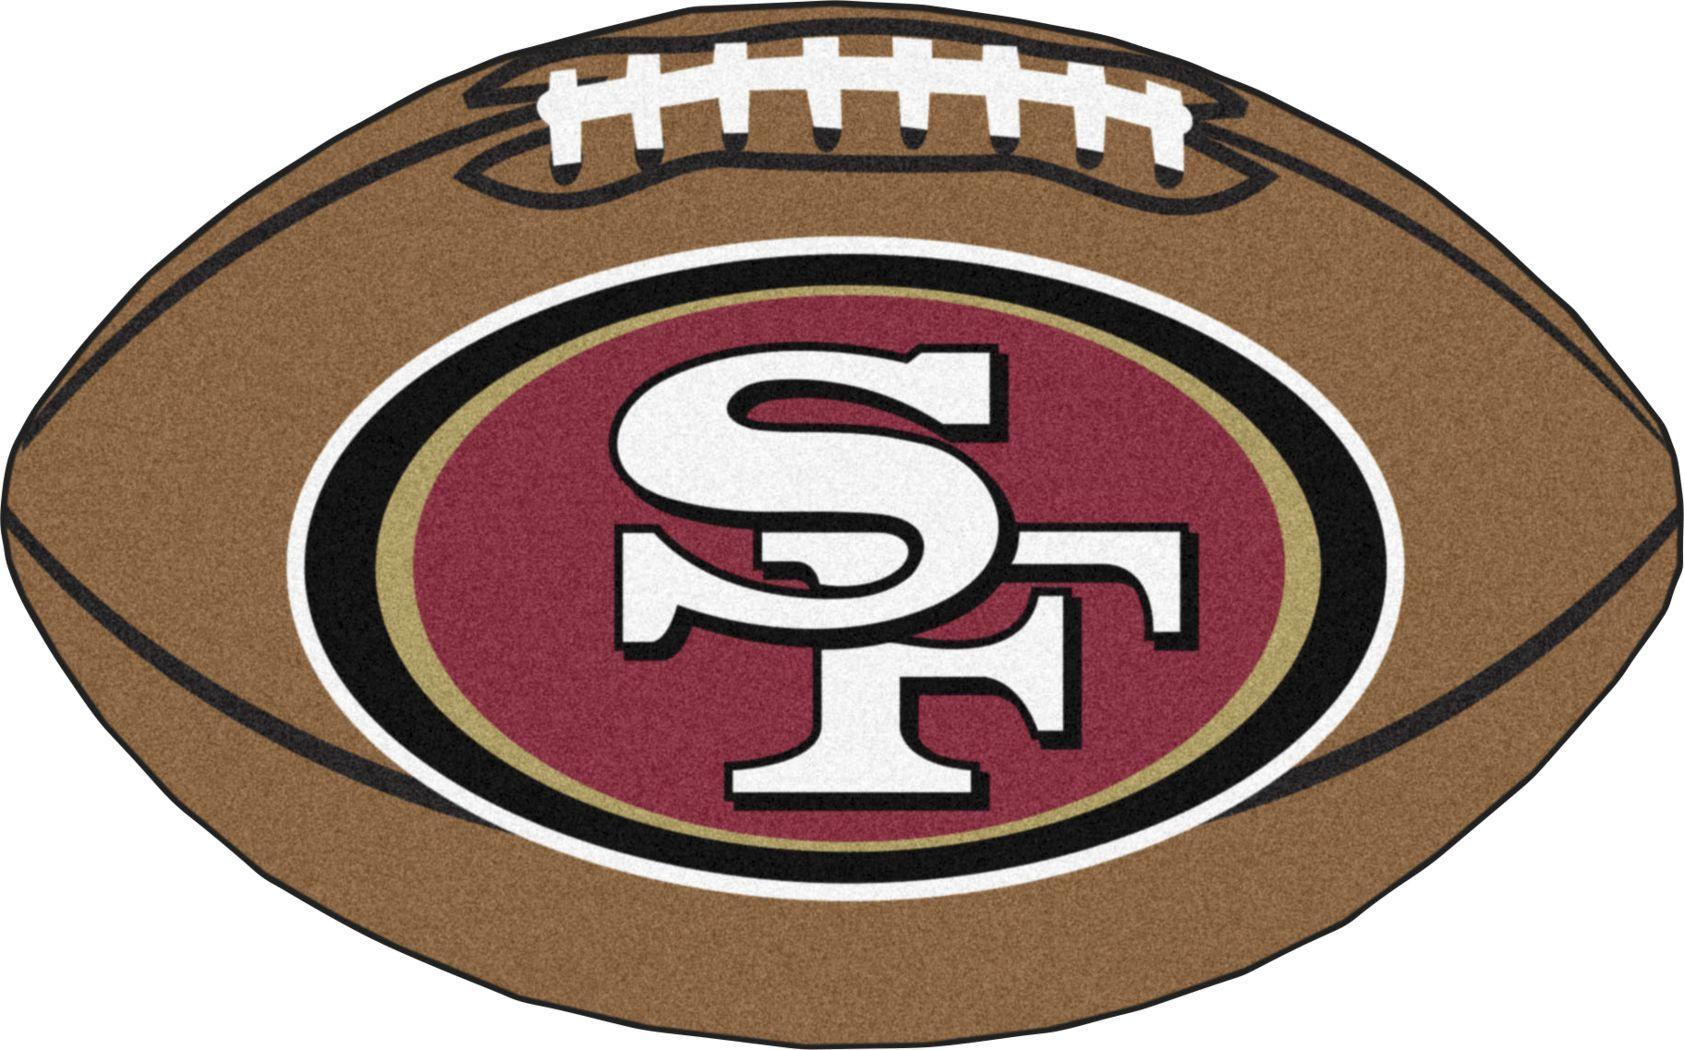 "NFL Football Mascot San Francisco 49ERS 1'6"" x 1'10"" Rug"